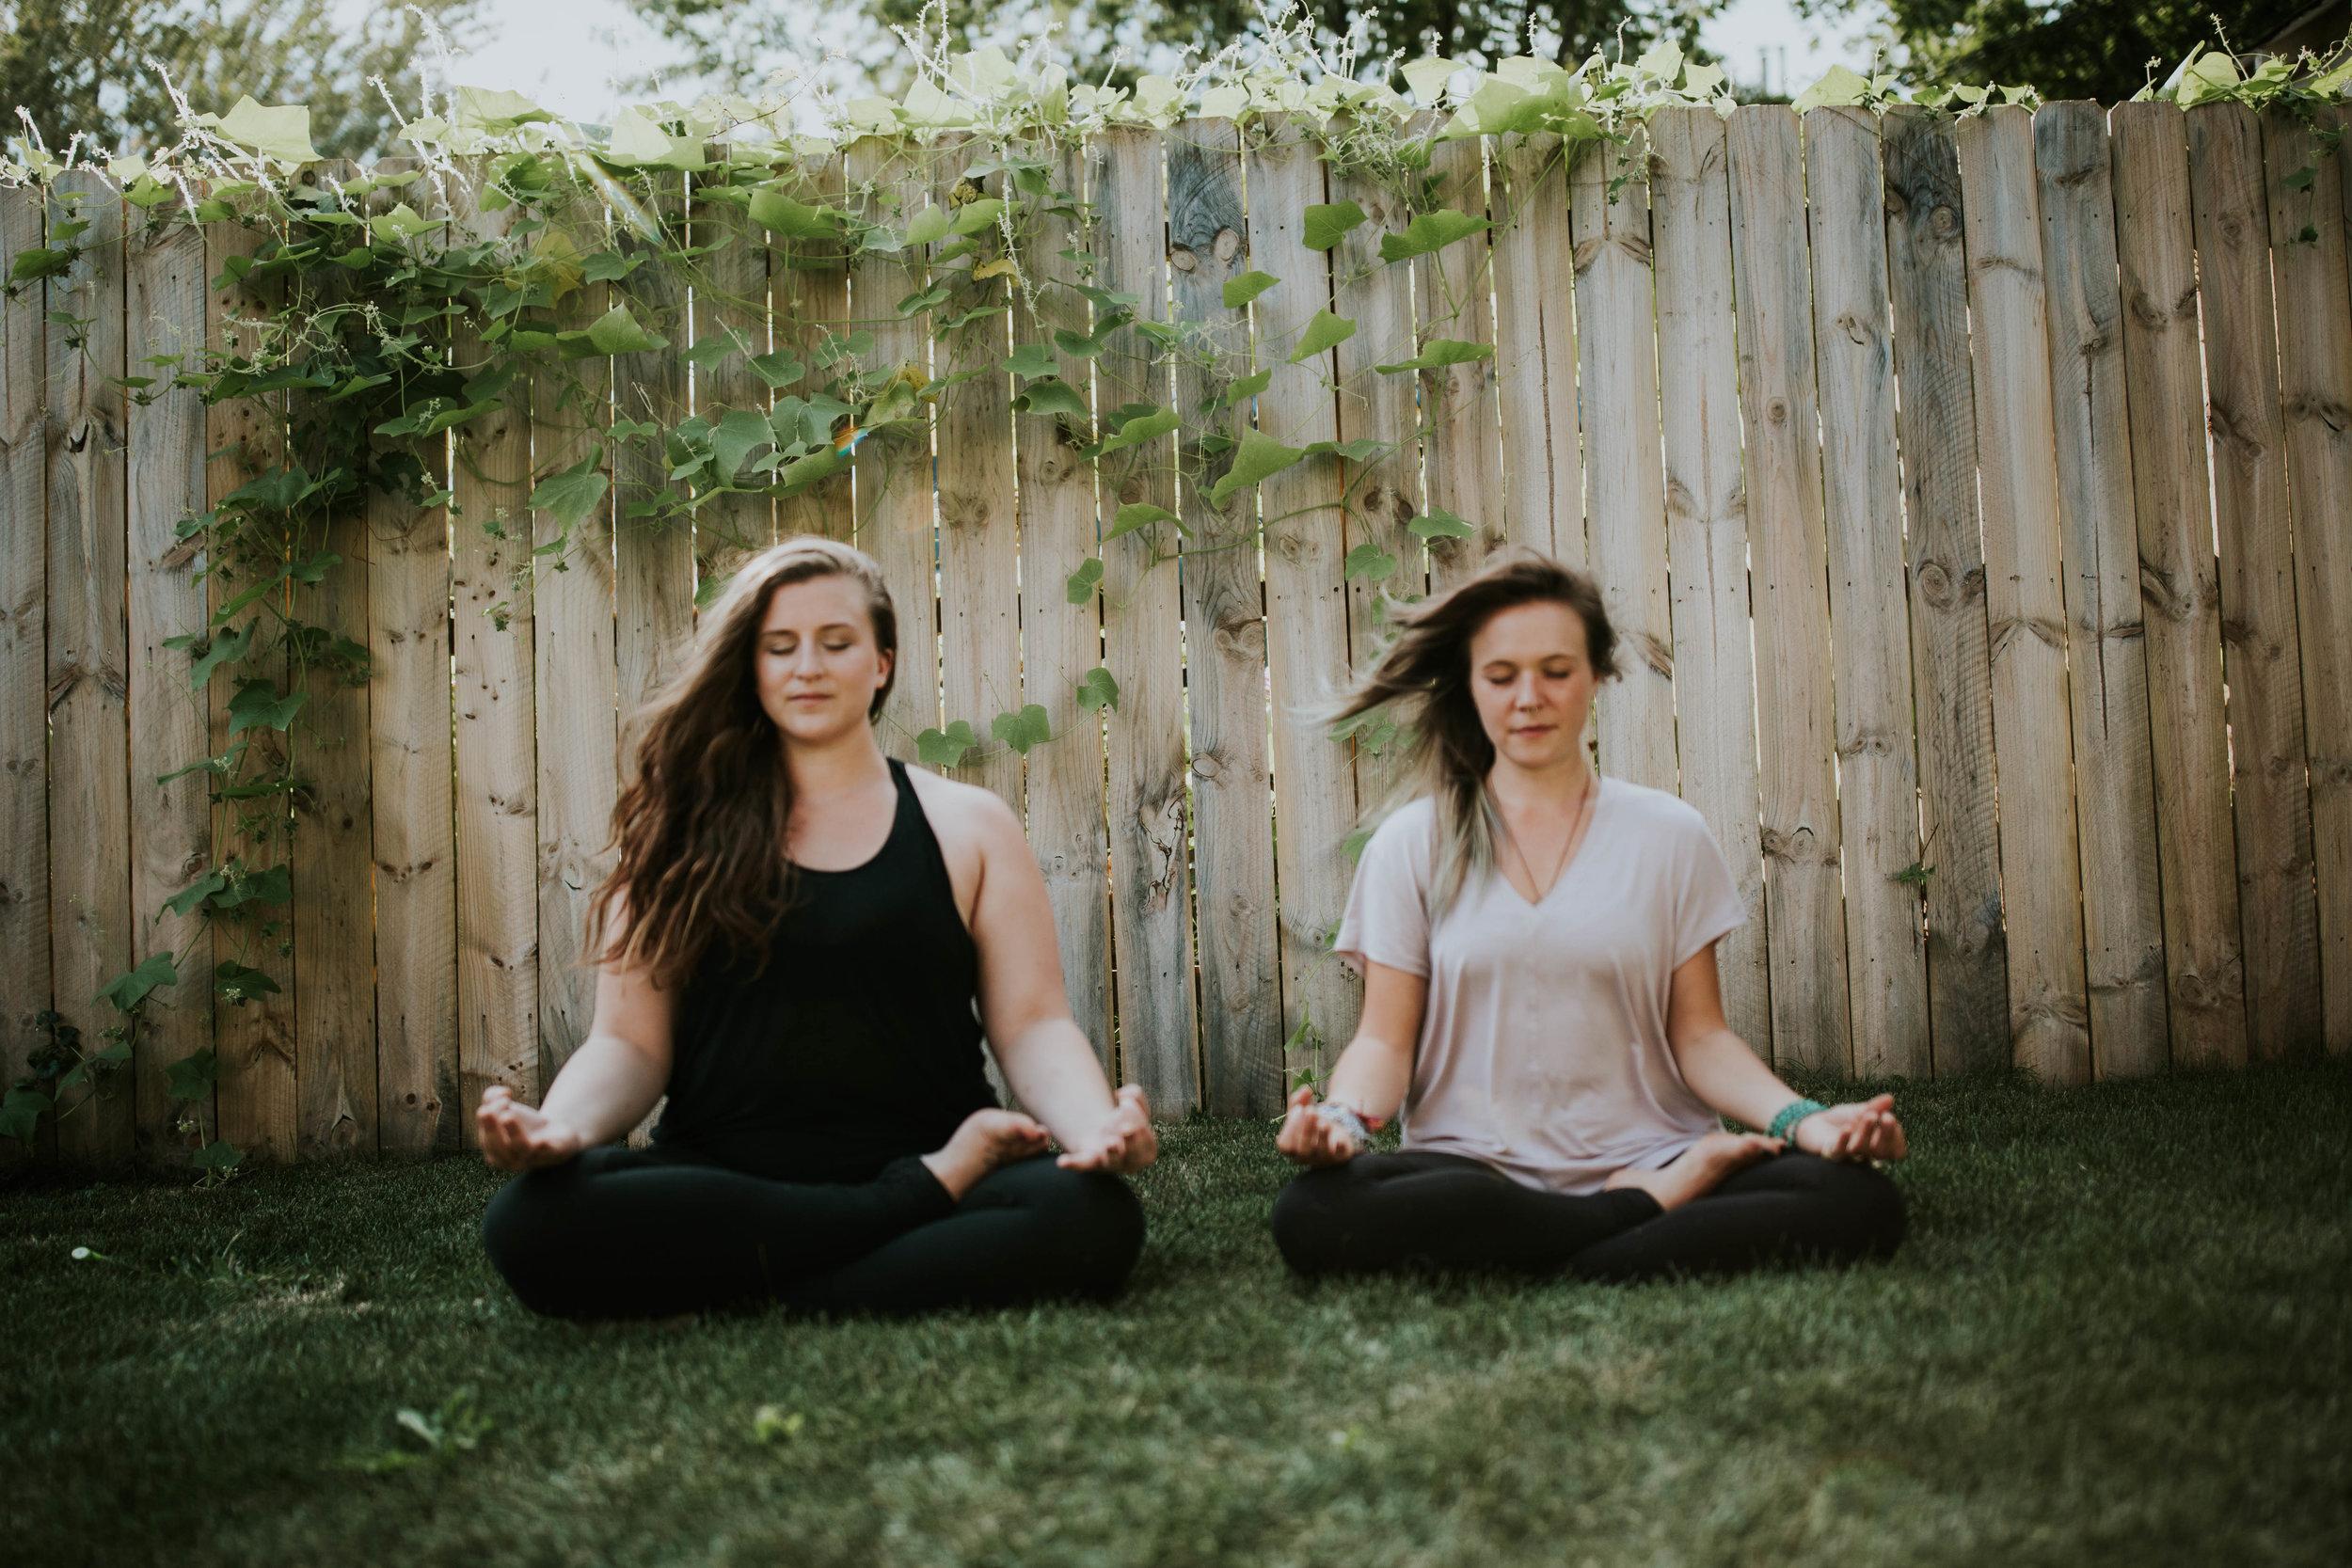 sacred-space-yoga-meditation-minneapolis.jpg